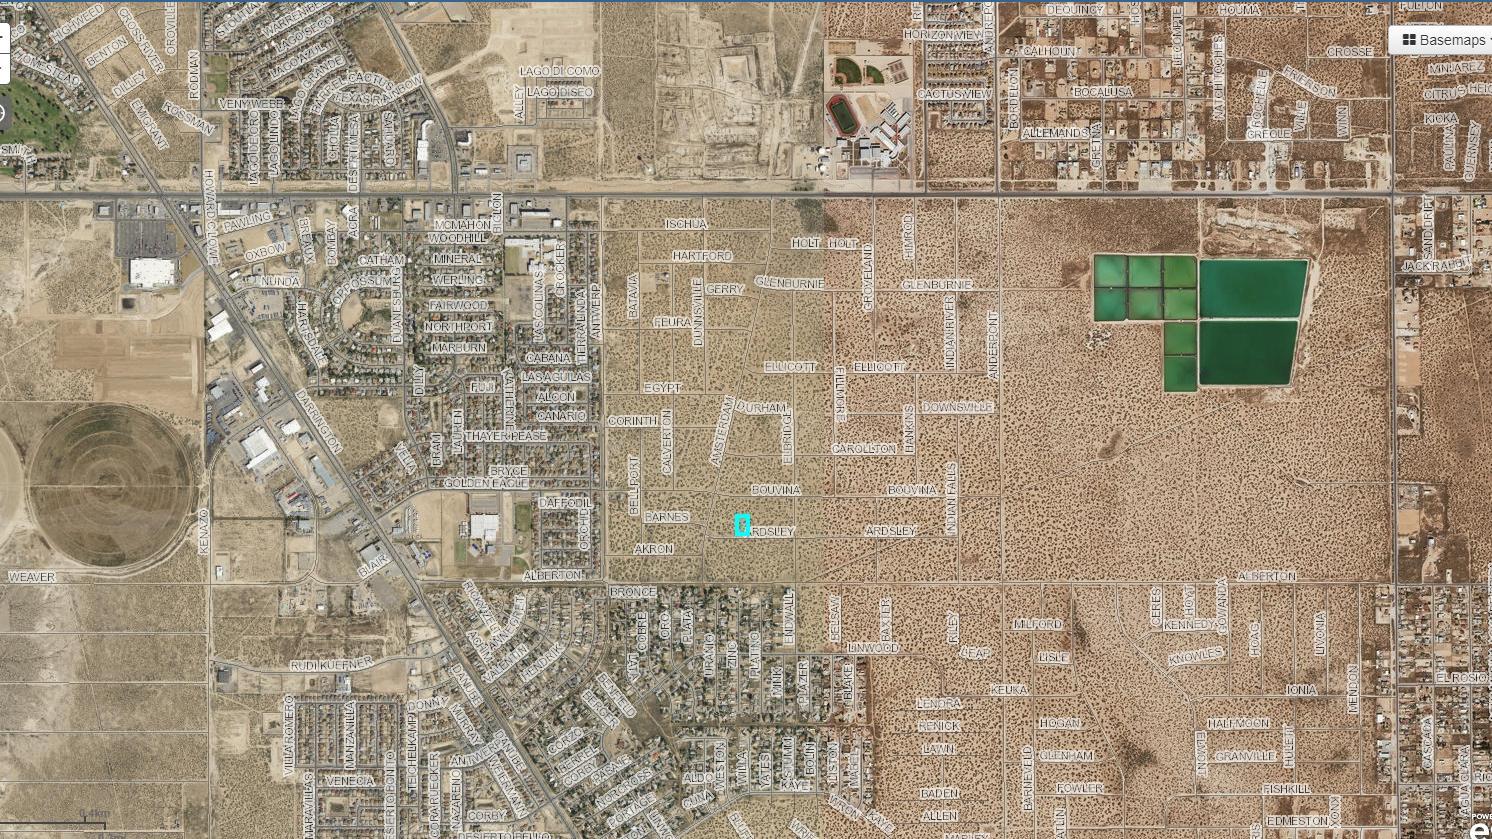 0 Ardsley Avenue, Horizon City, Texas 79928, ,Land,For sale,Ardsley,812034